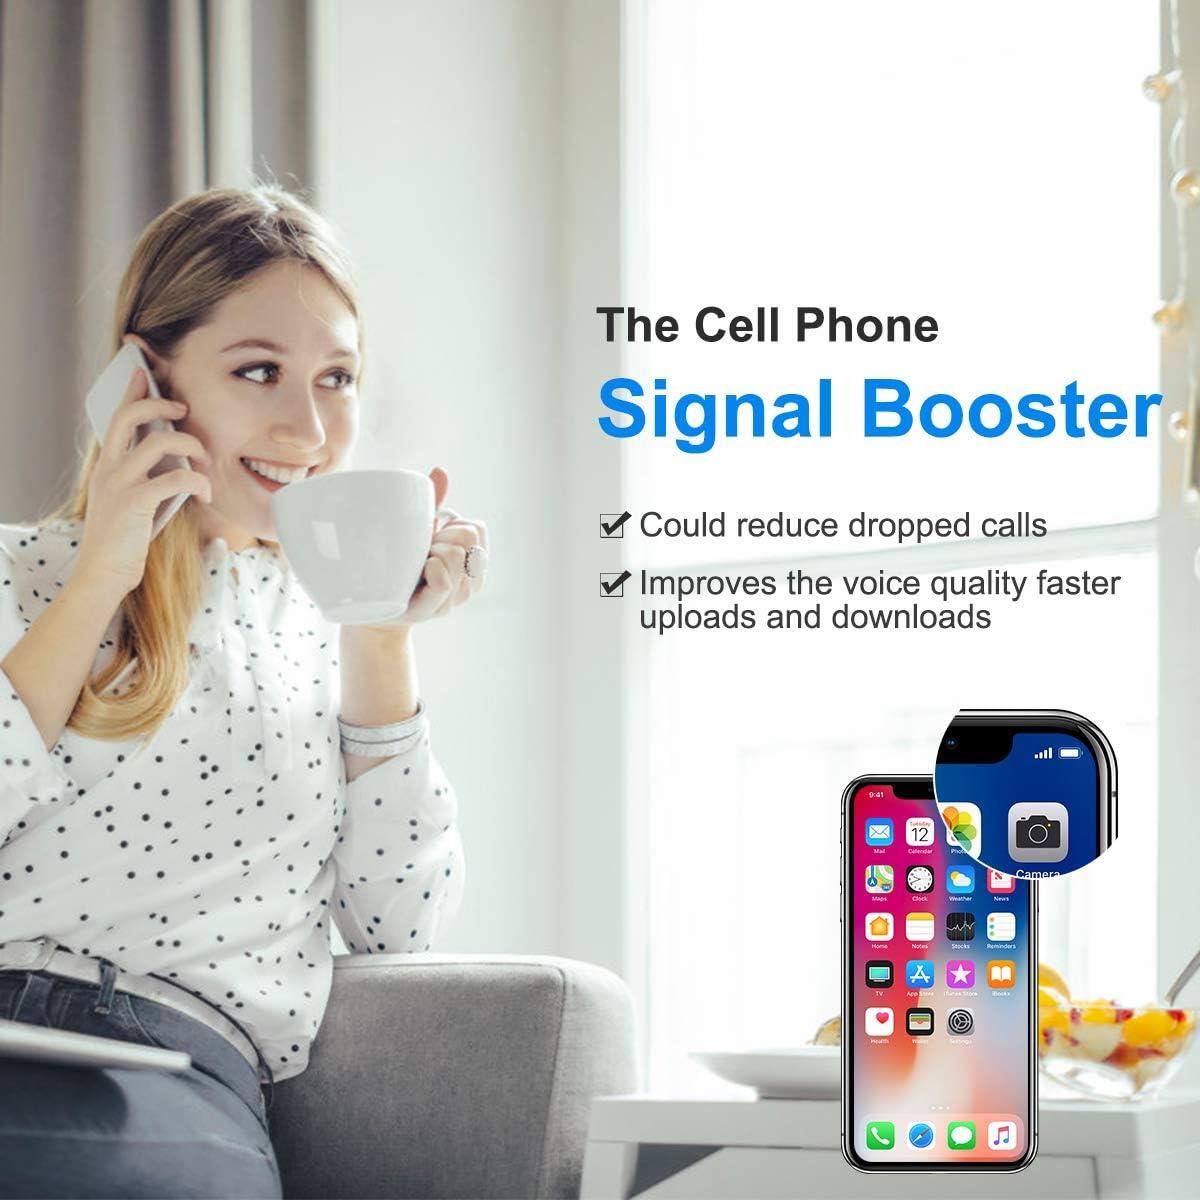 Cell Phone Signal Booster Verizon 4G LTE 700Mhz FDD Band13 Boost Data and Voice Verizon Cell Signal Booster Verizon Cell Phone Booster Repeater Mobile Signal Booster Amplifier BOSURU With Antennas Kit